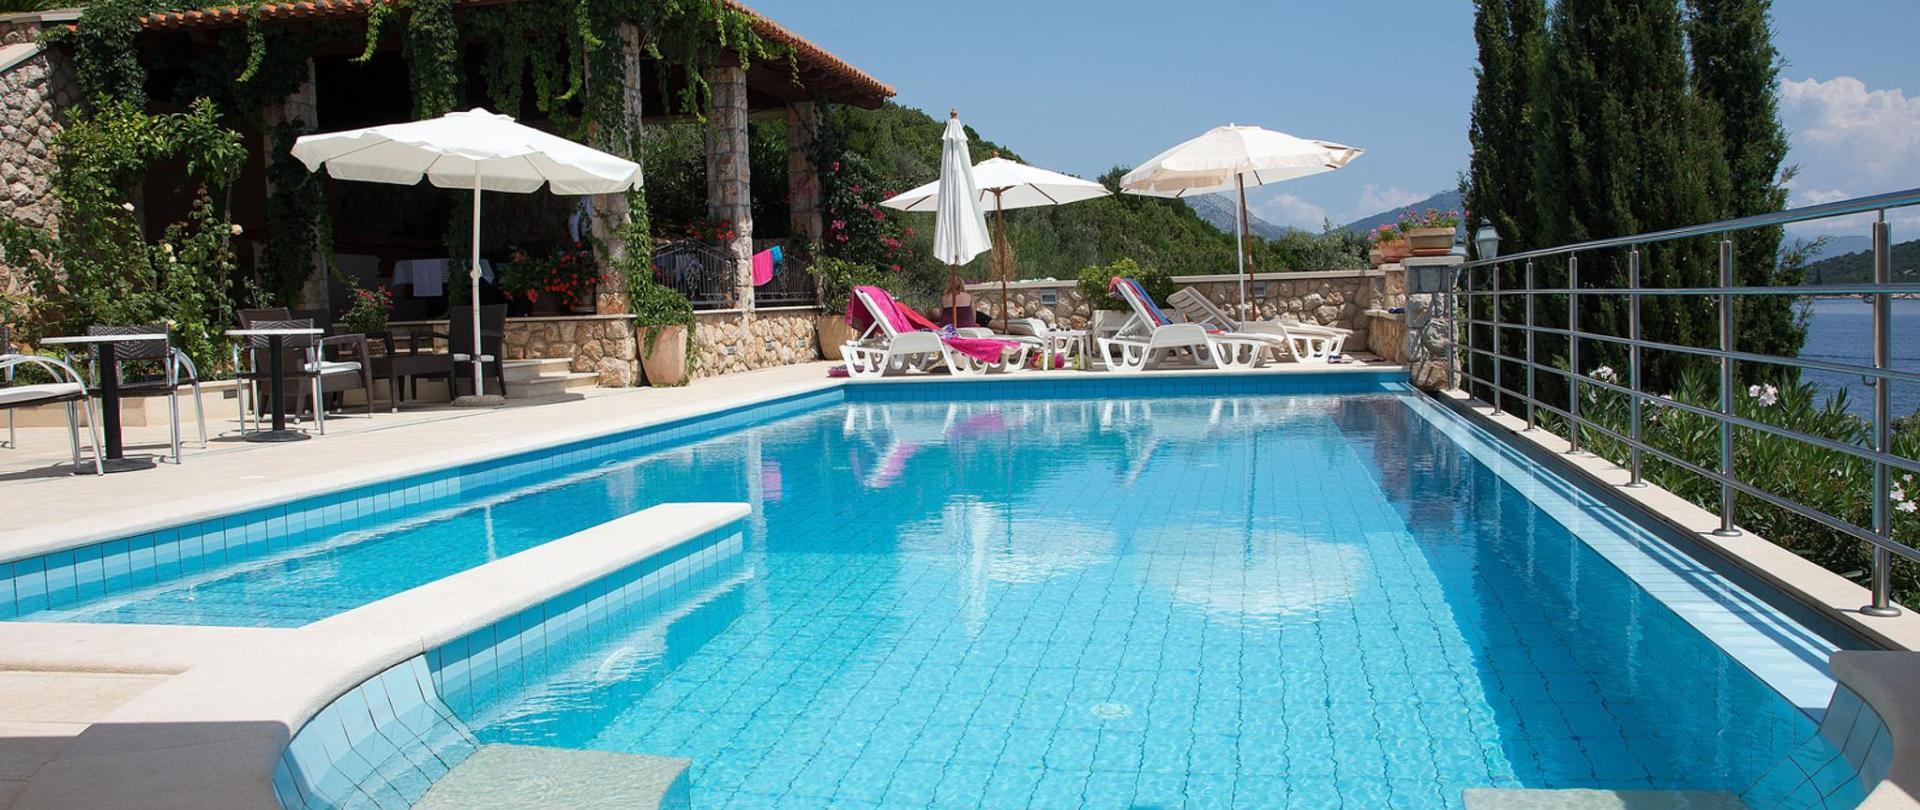 Hotel Bozica Dubrovnik otoci